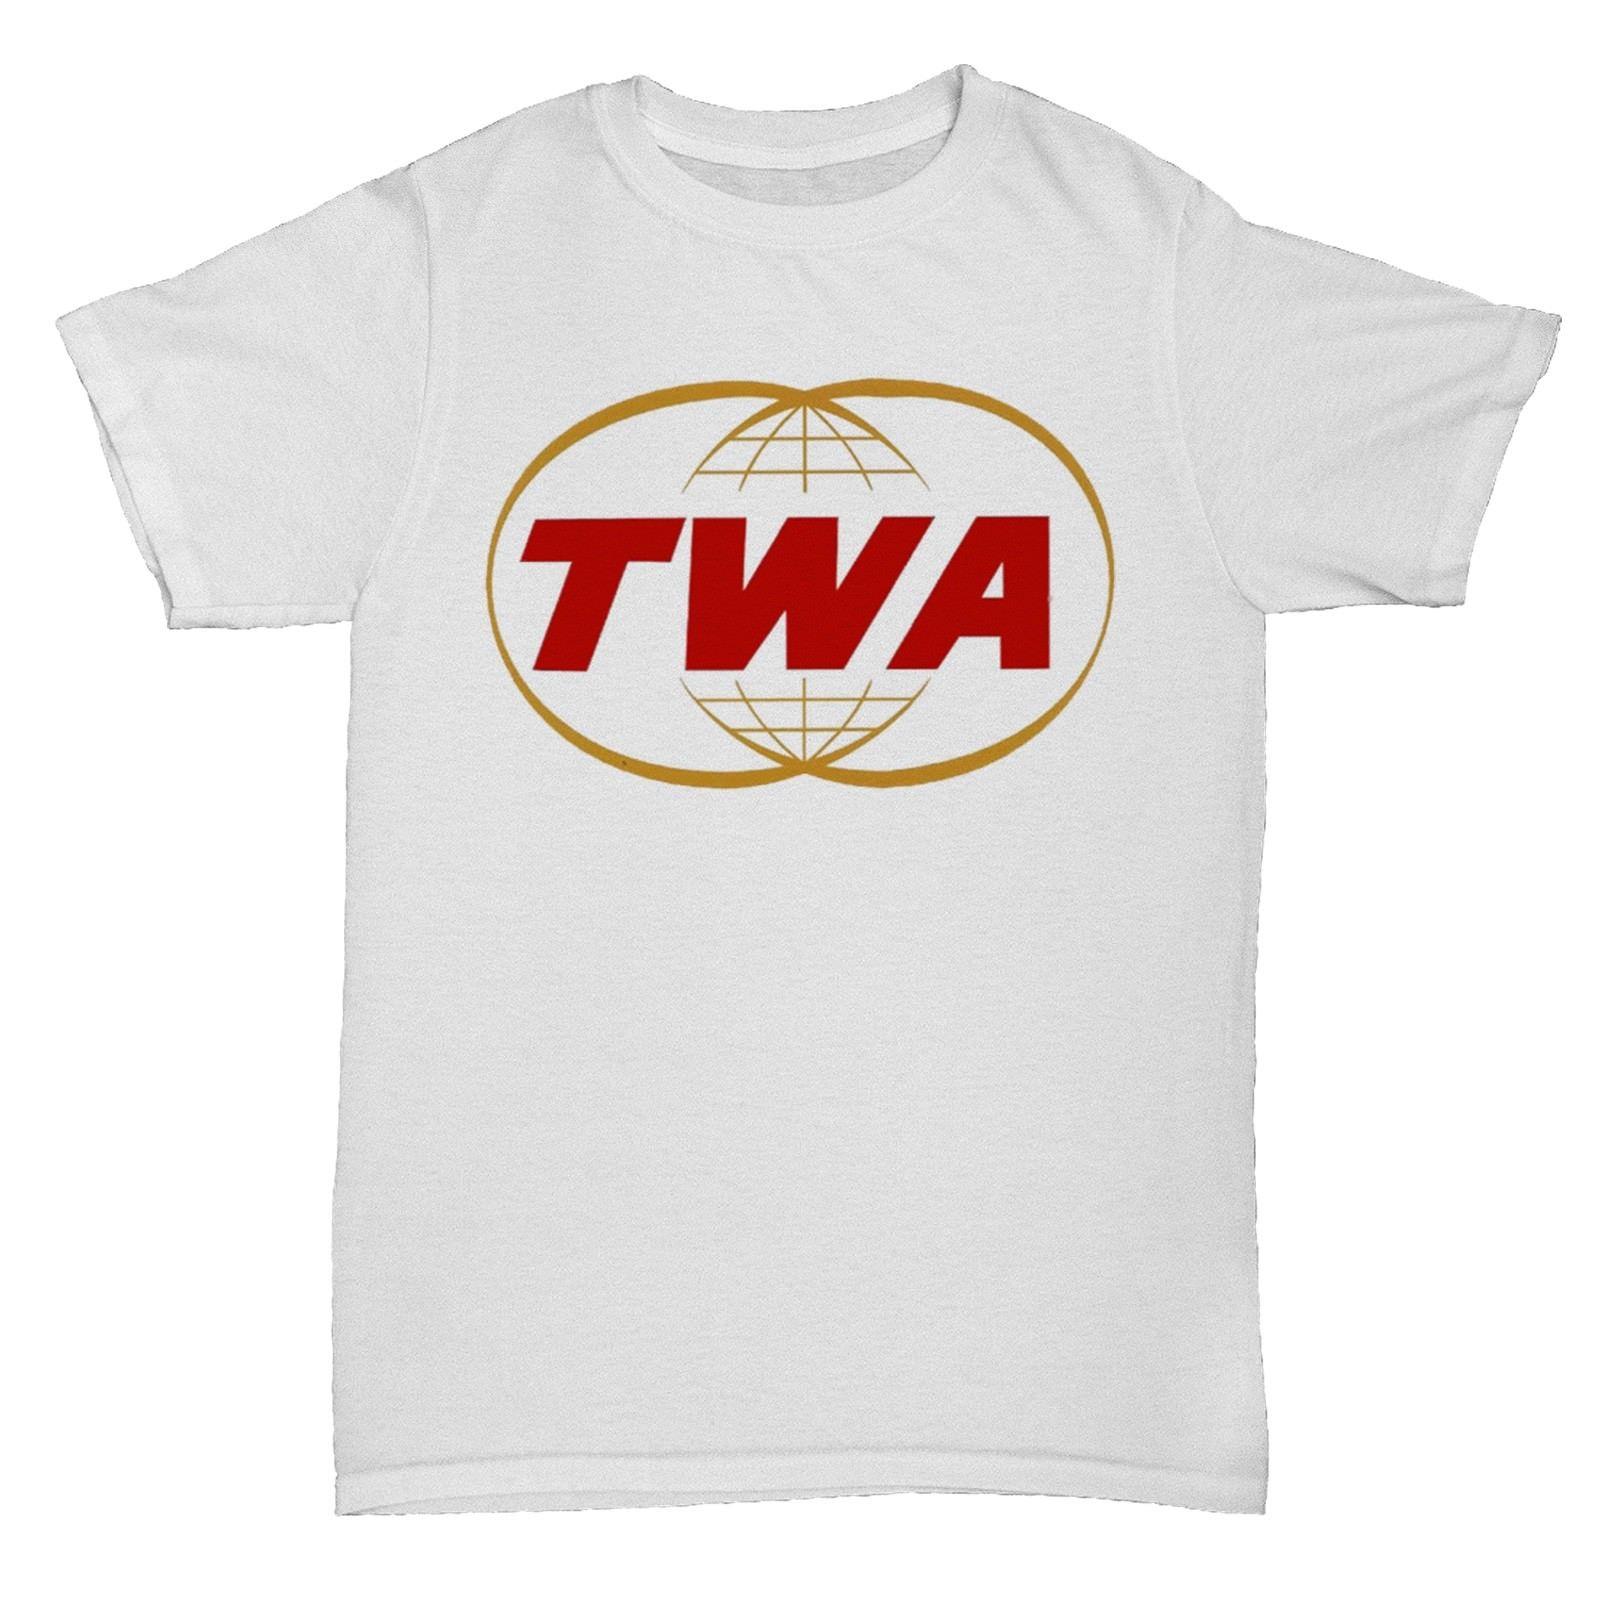 TWA TRANS AIRWAYS BA AIRLINES RETRO AEROPLANE BOAC PAN AM T SHIRT